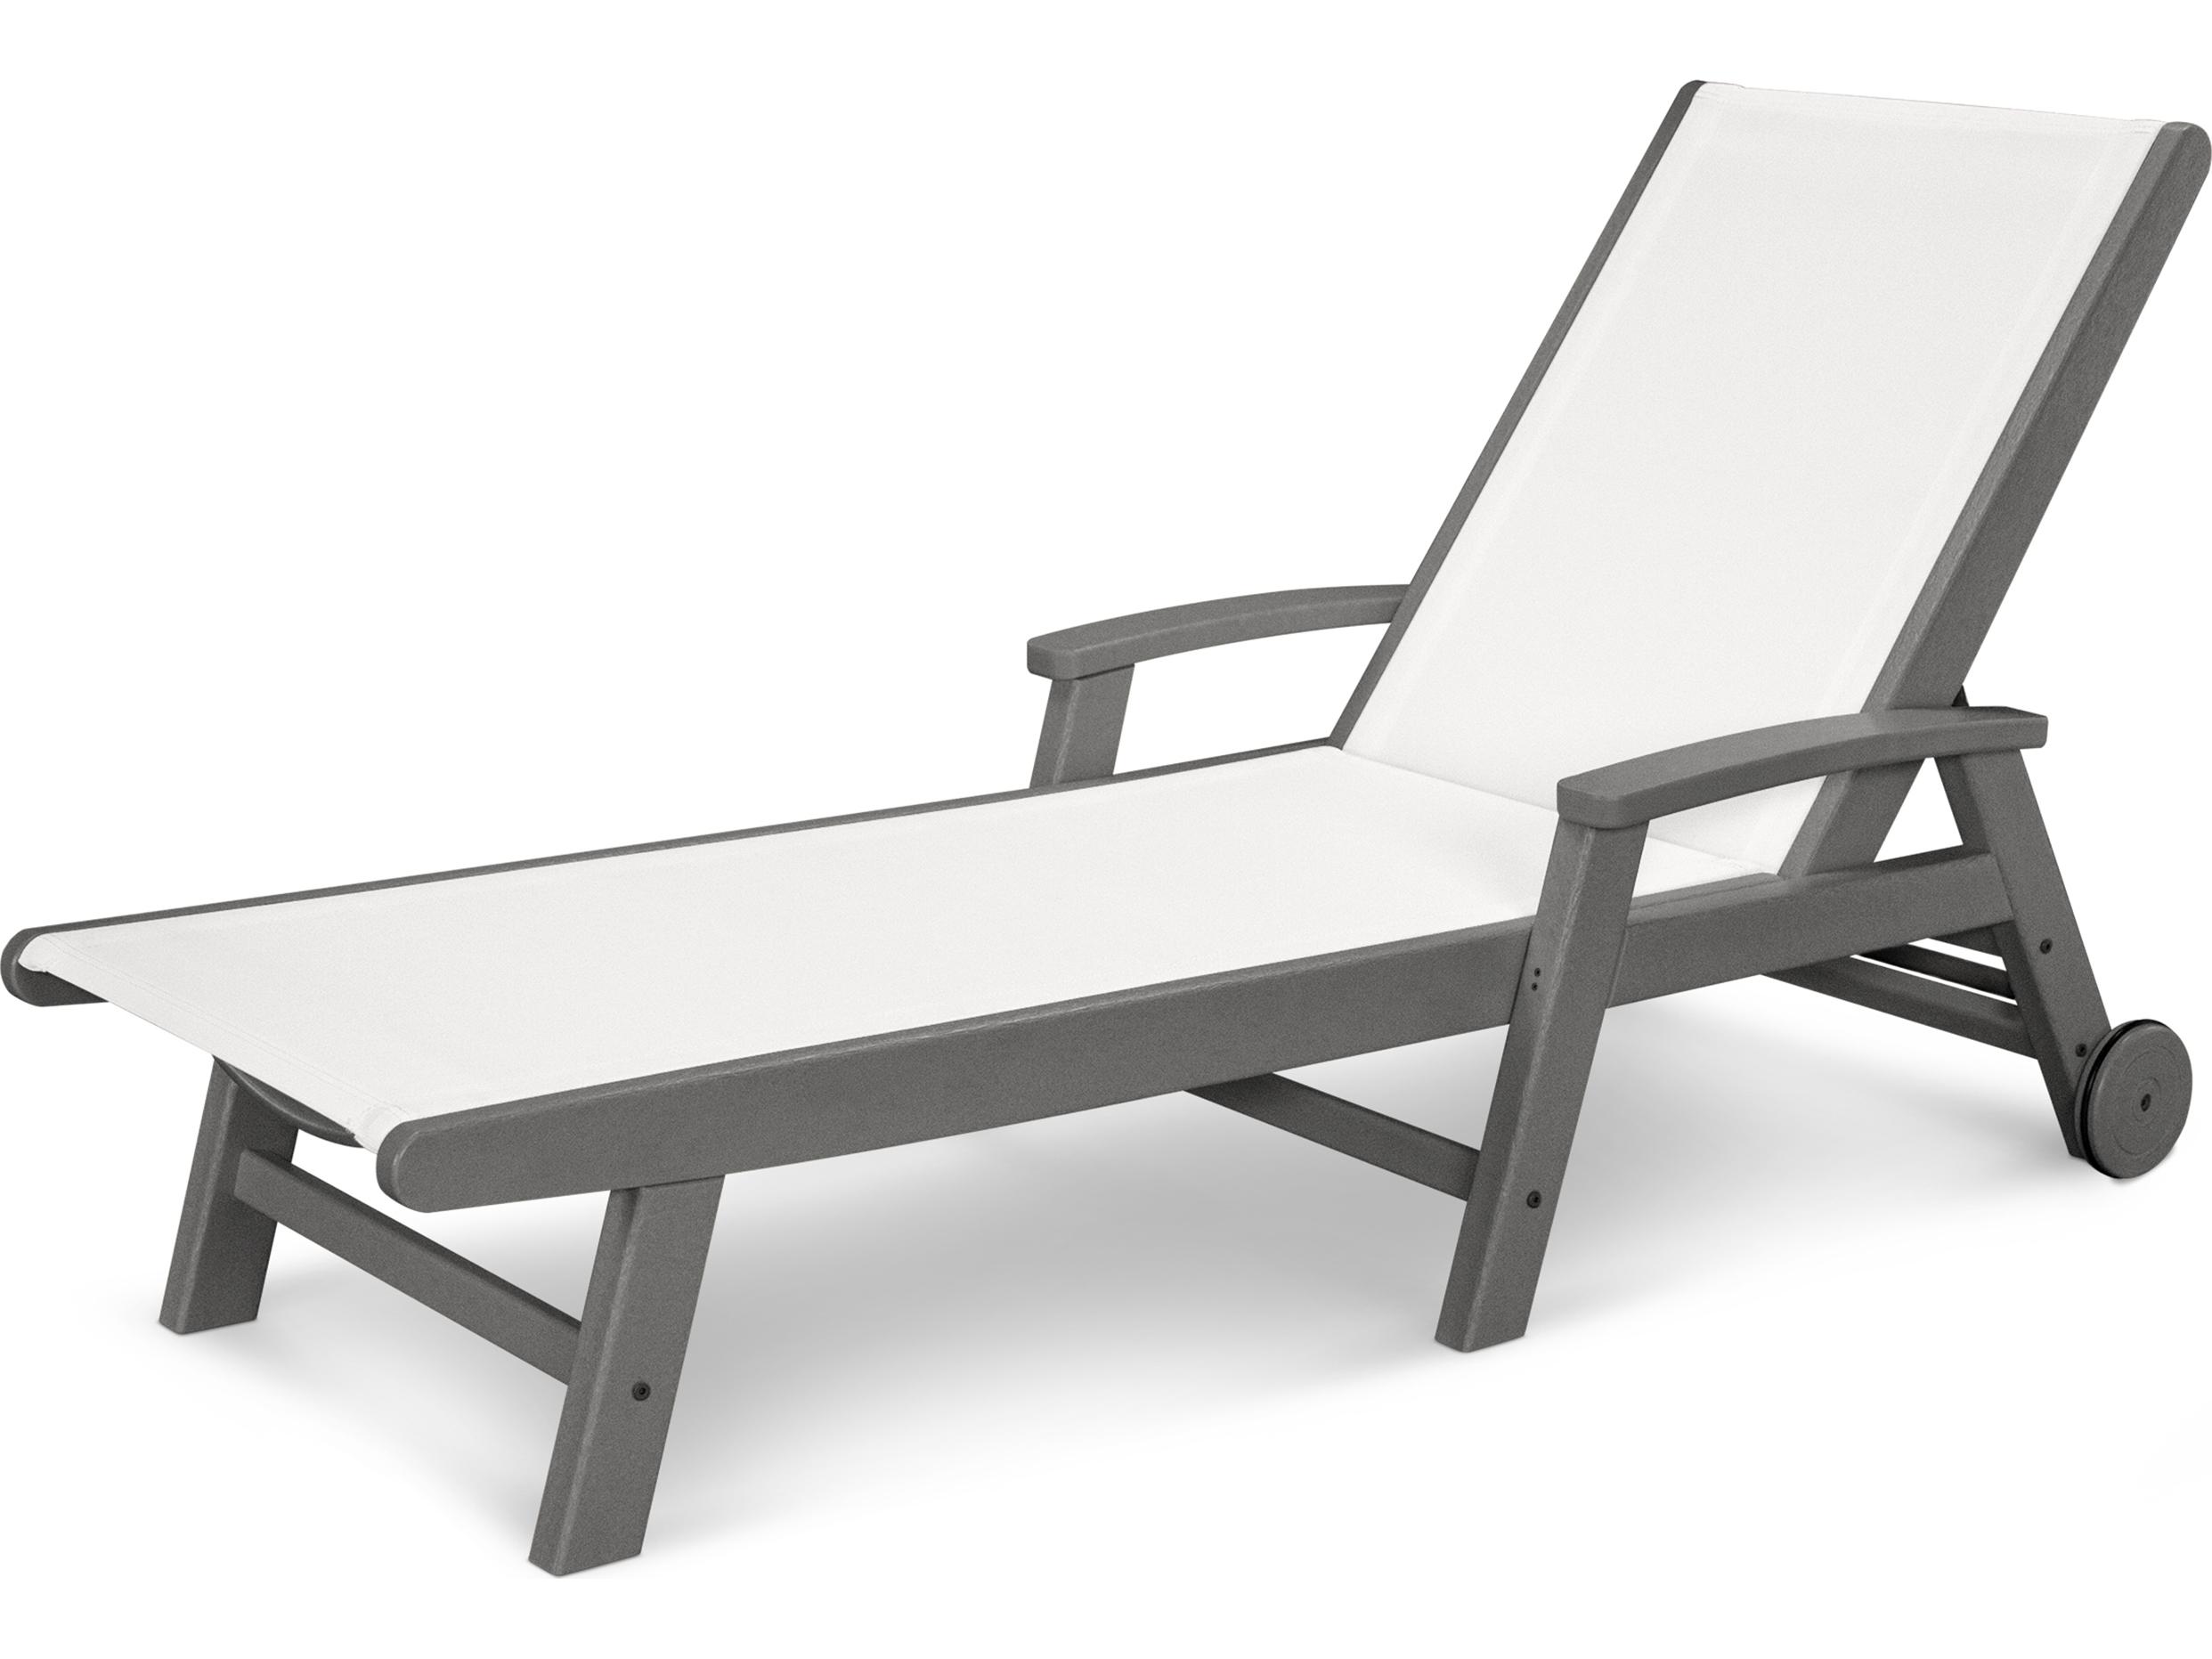 Polywood coastal sling aluminum chaise lounge sw2290 for Aluminium chaise